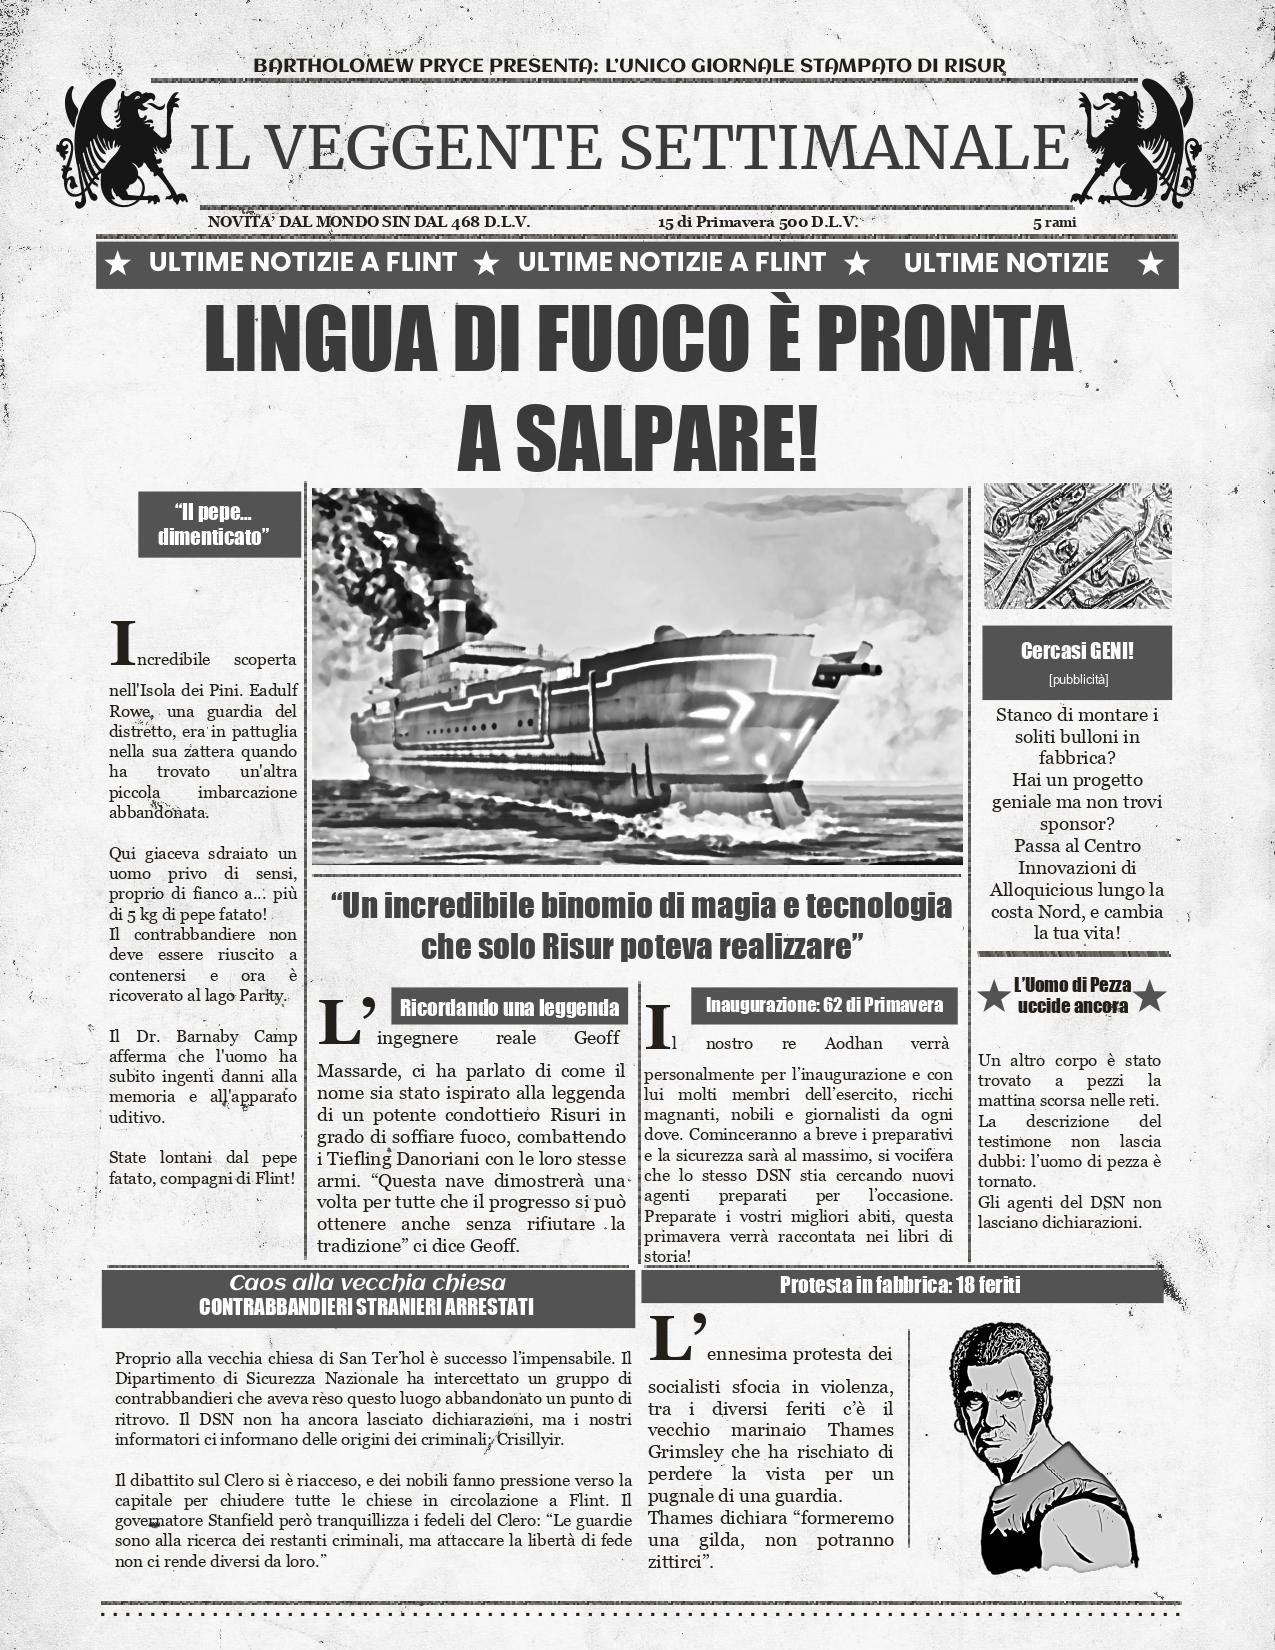 Il veggente settimanale (1)_pages-to-jpg-0001.jpg